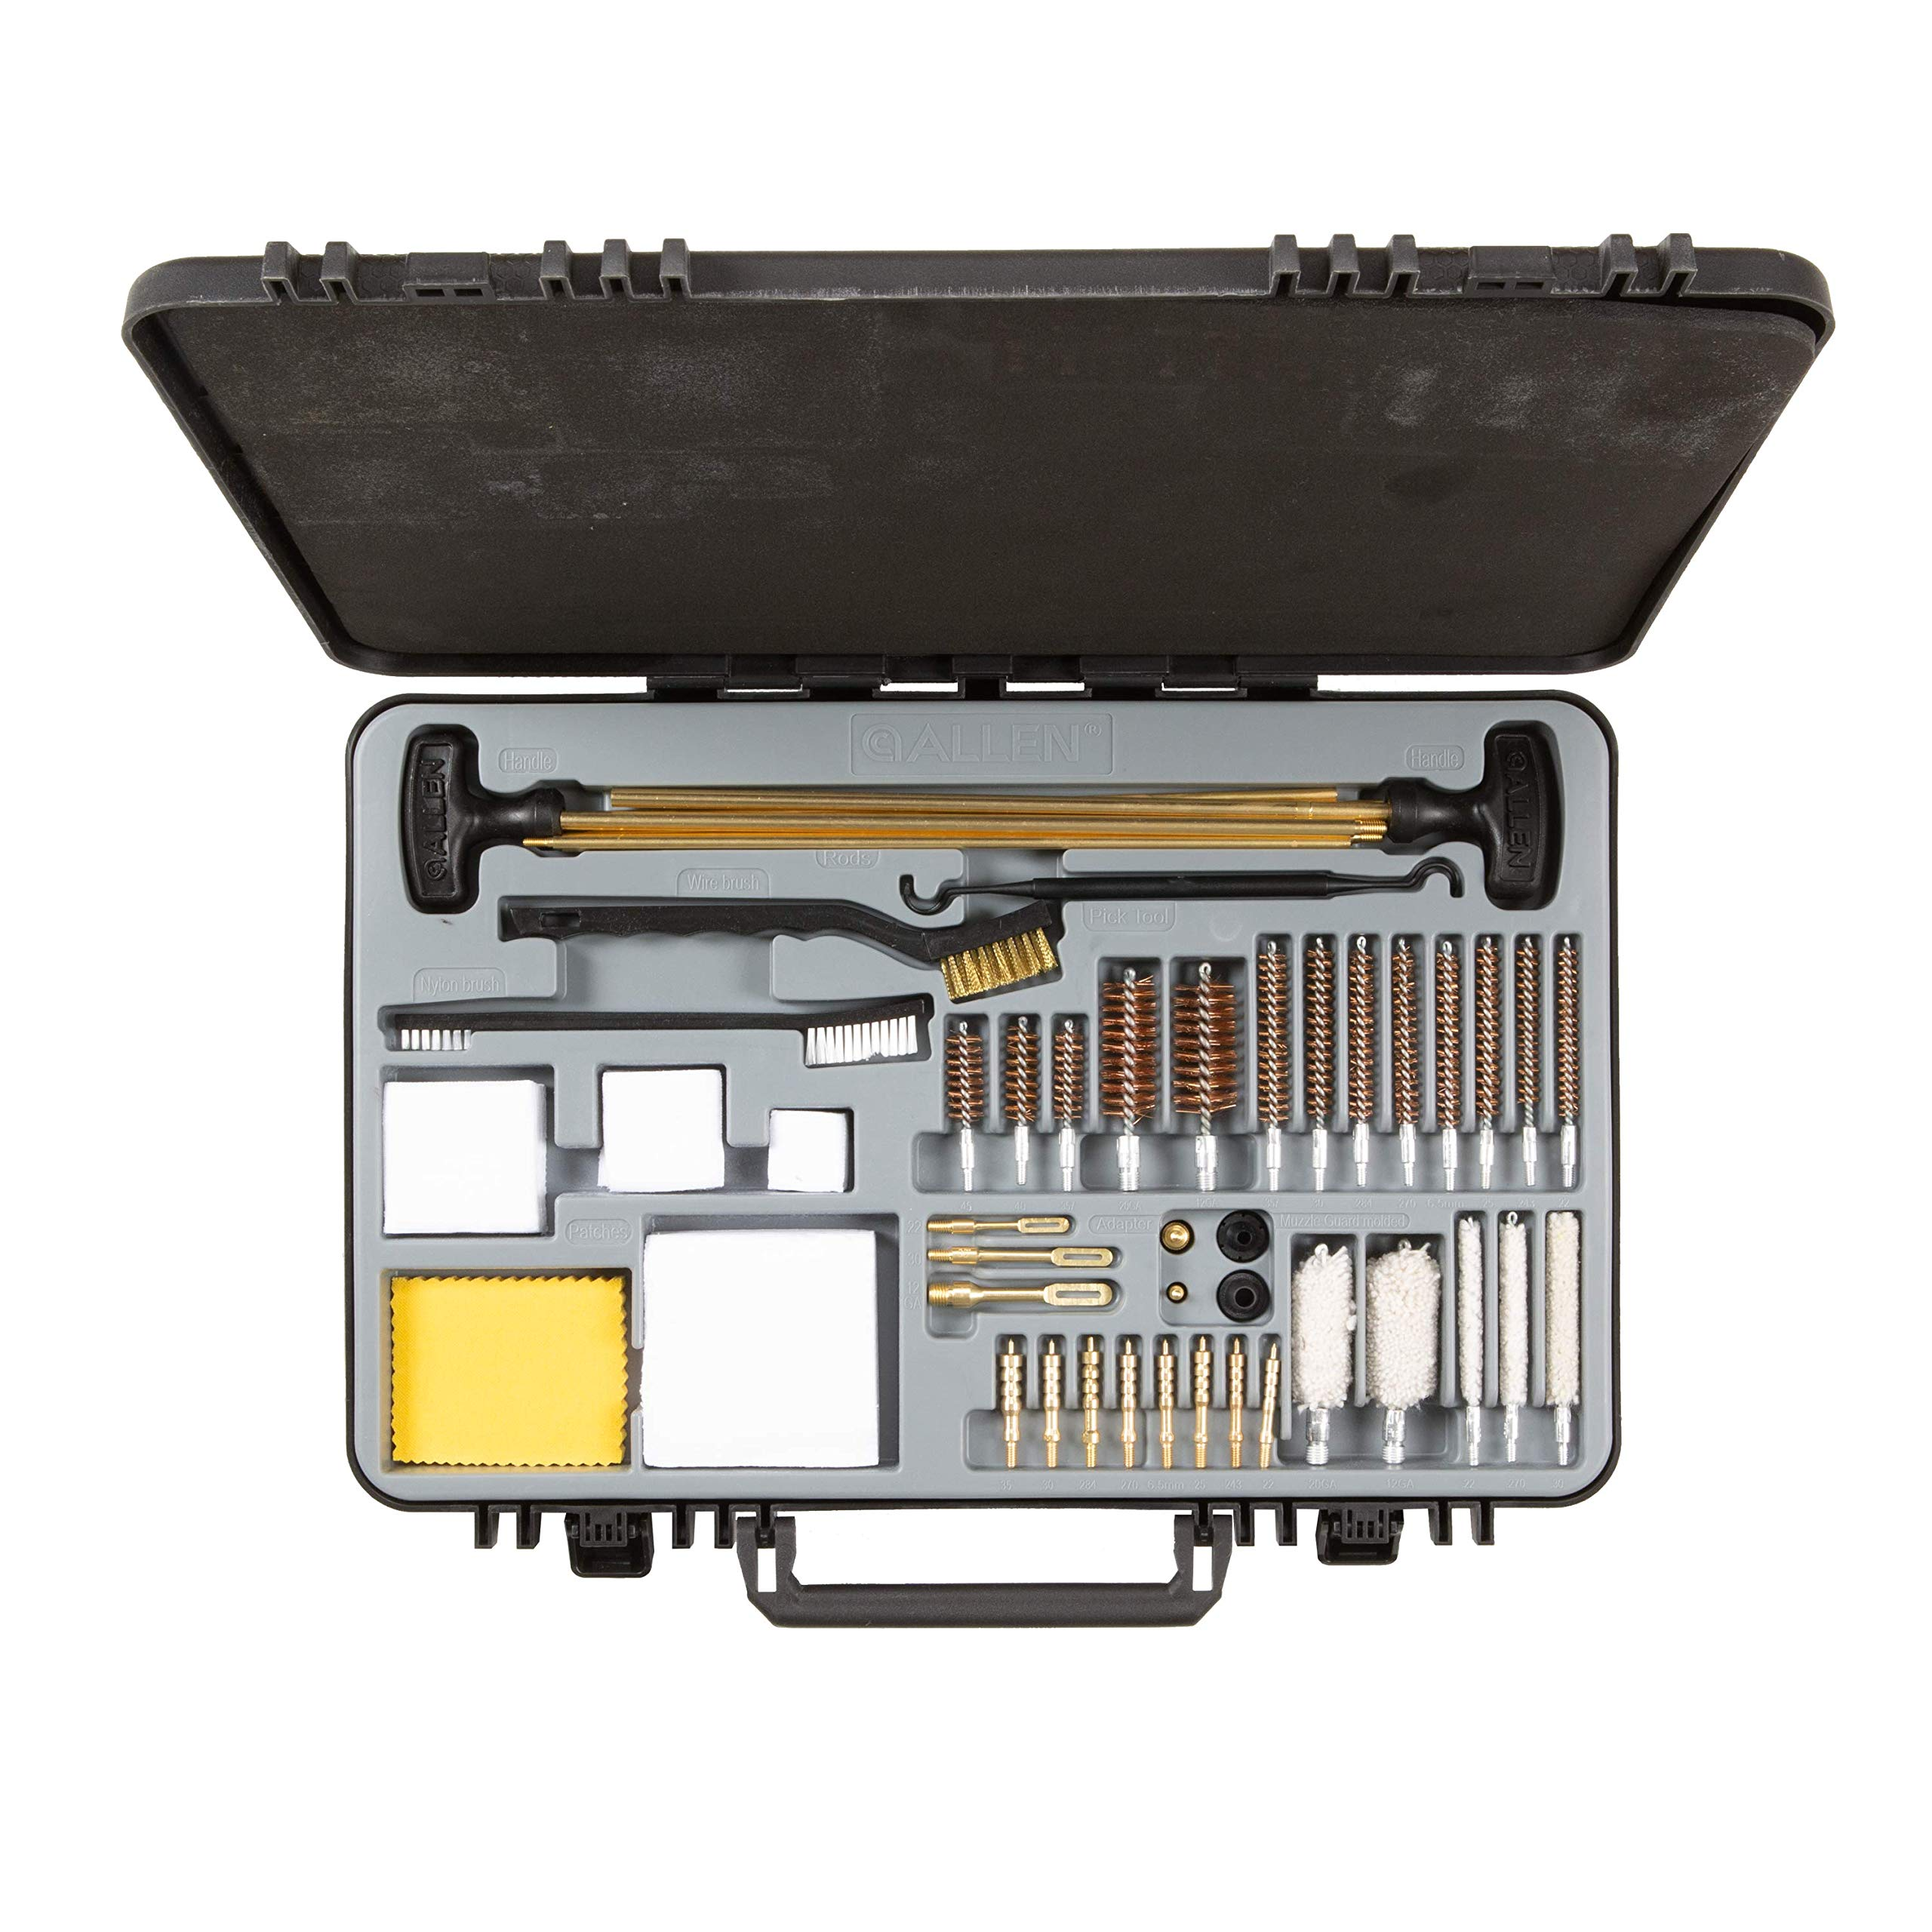 Allen Company - Krome Large Premium Quality Universal Gun Cleaning Kit, 50 Piece, Black